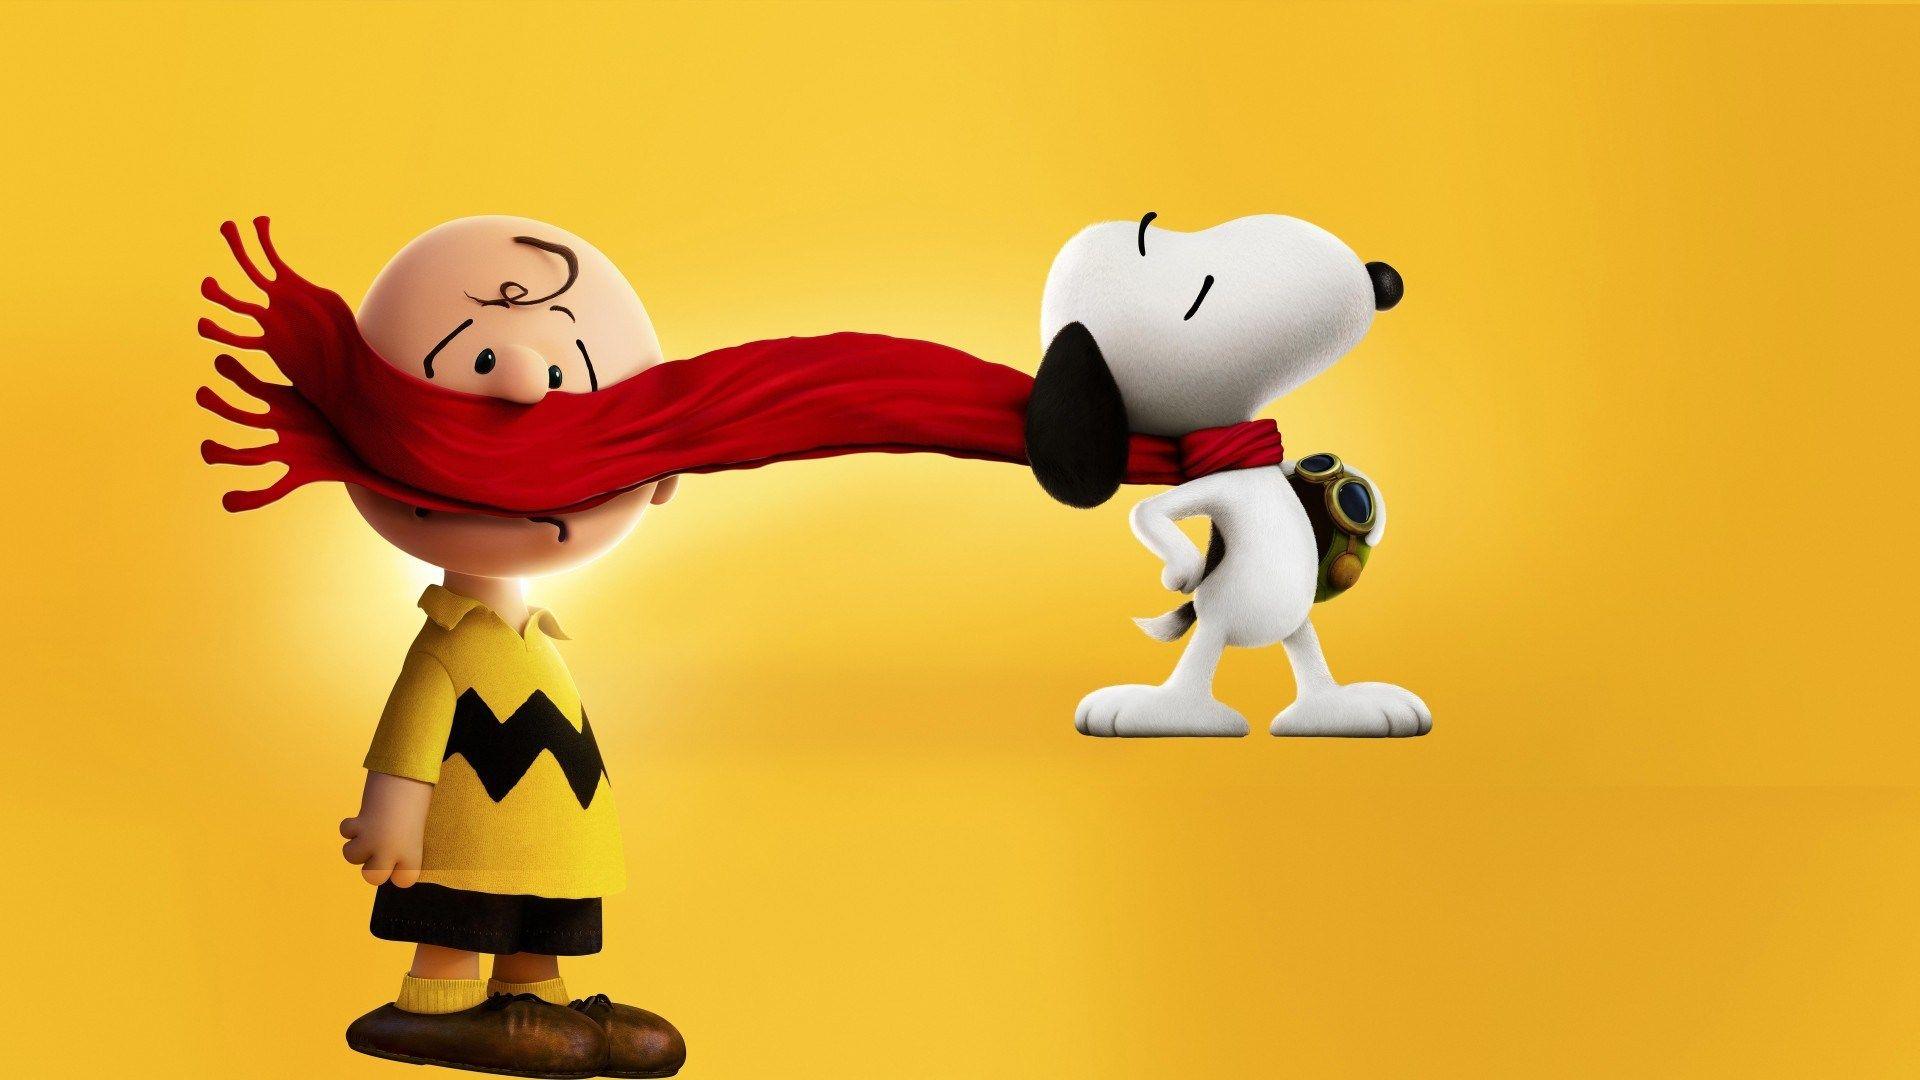 Peanuts wallpaper theme